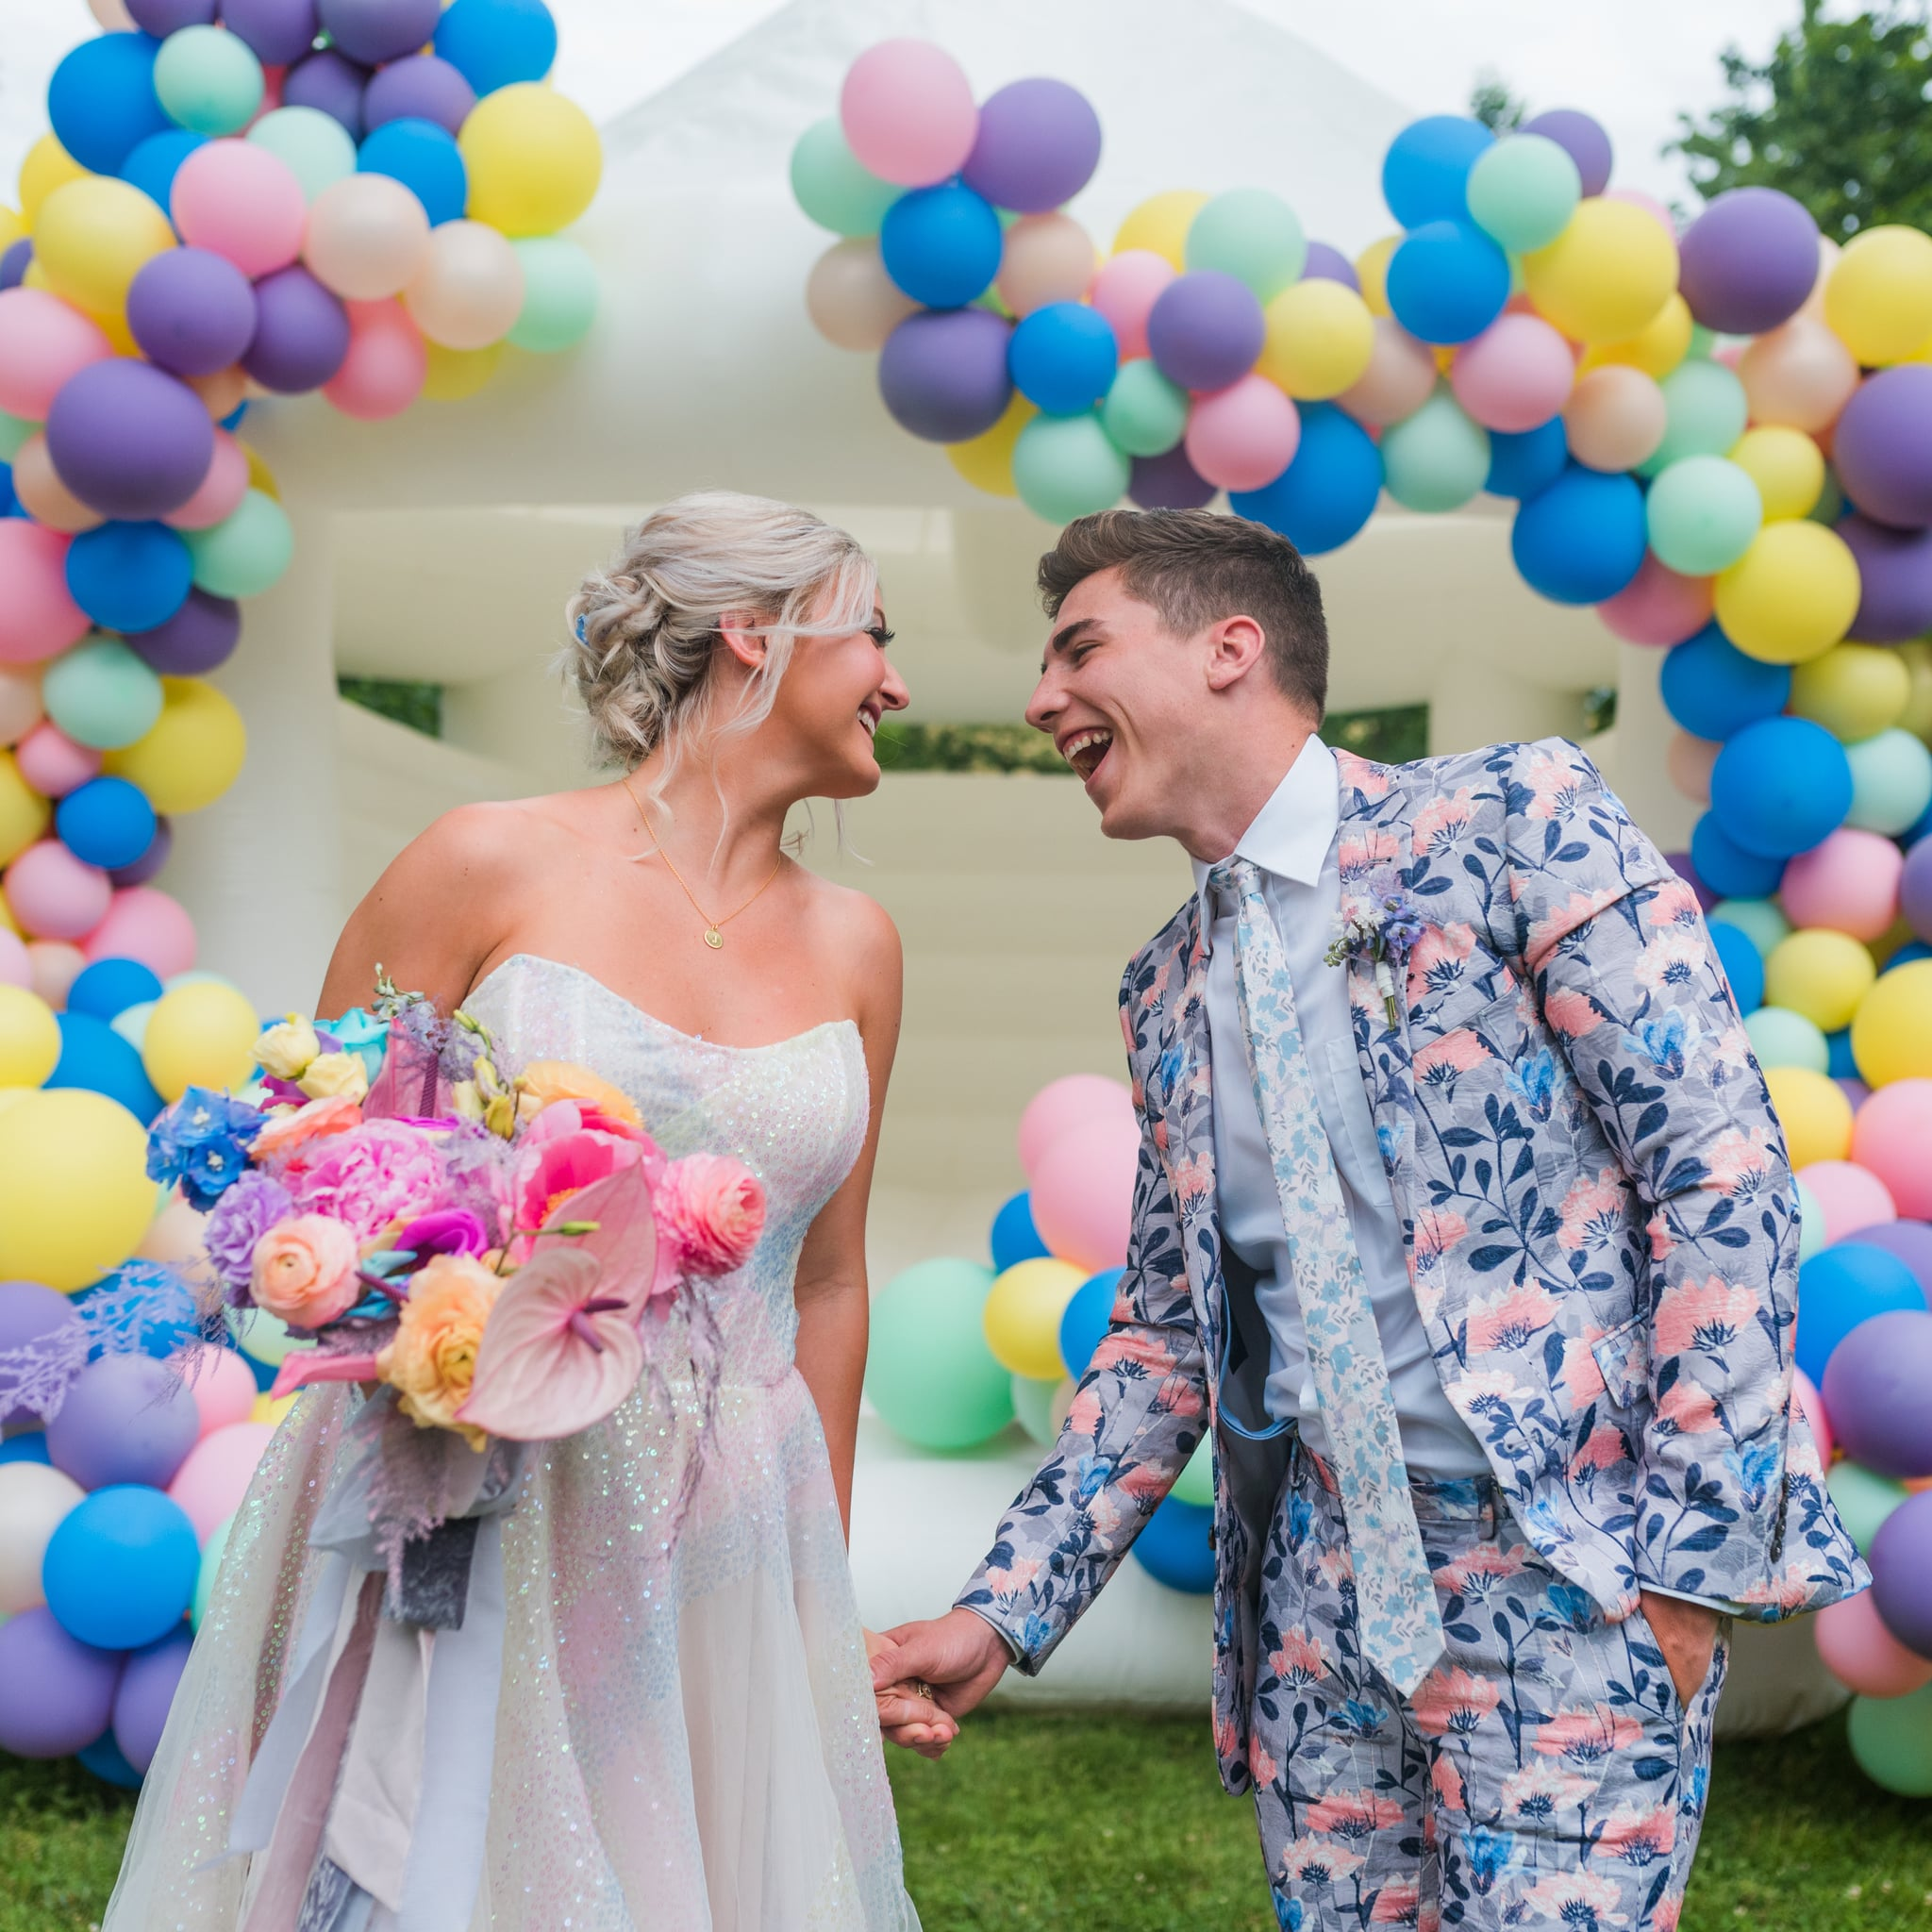 Taylor Swift Wedding Ideas 2019 Popsugar Love Sex